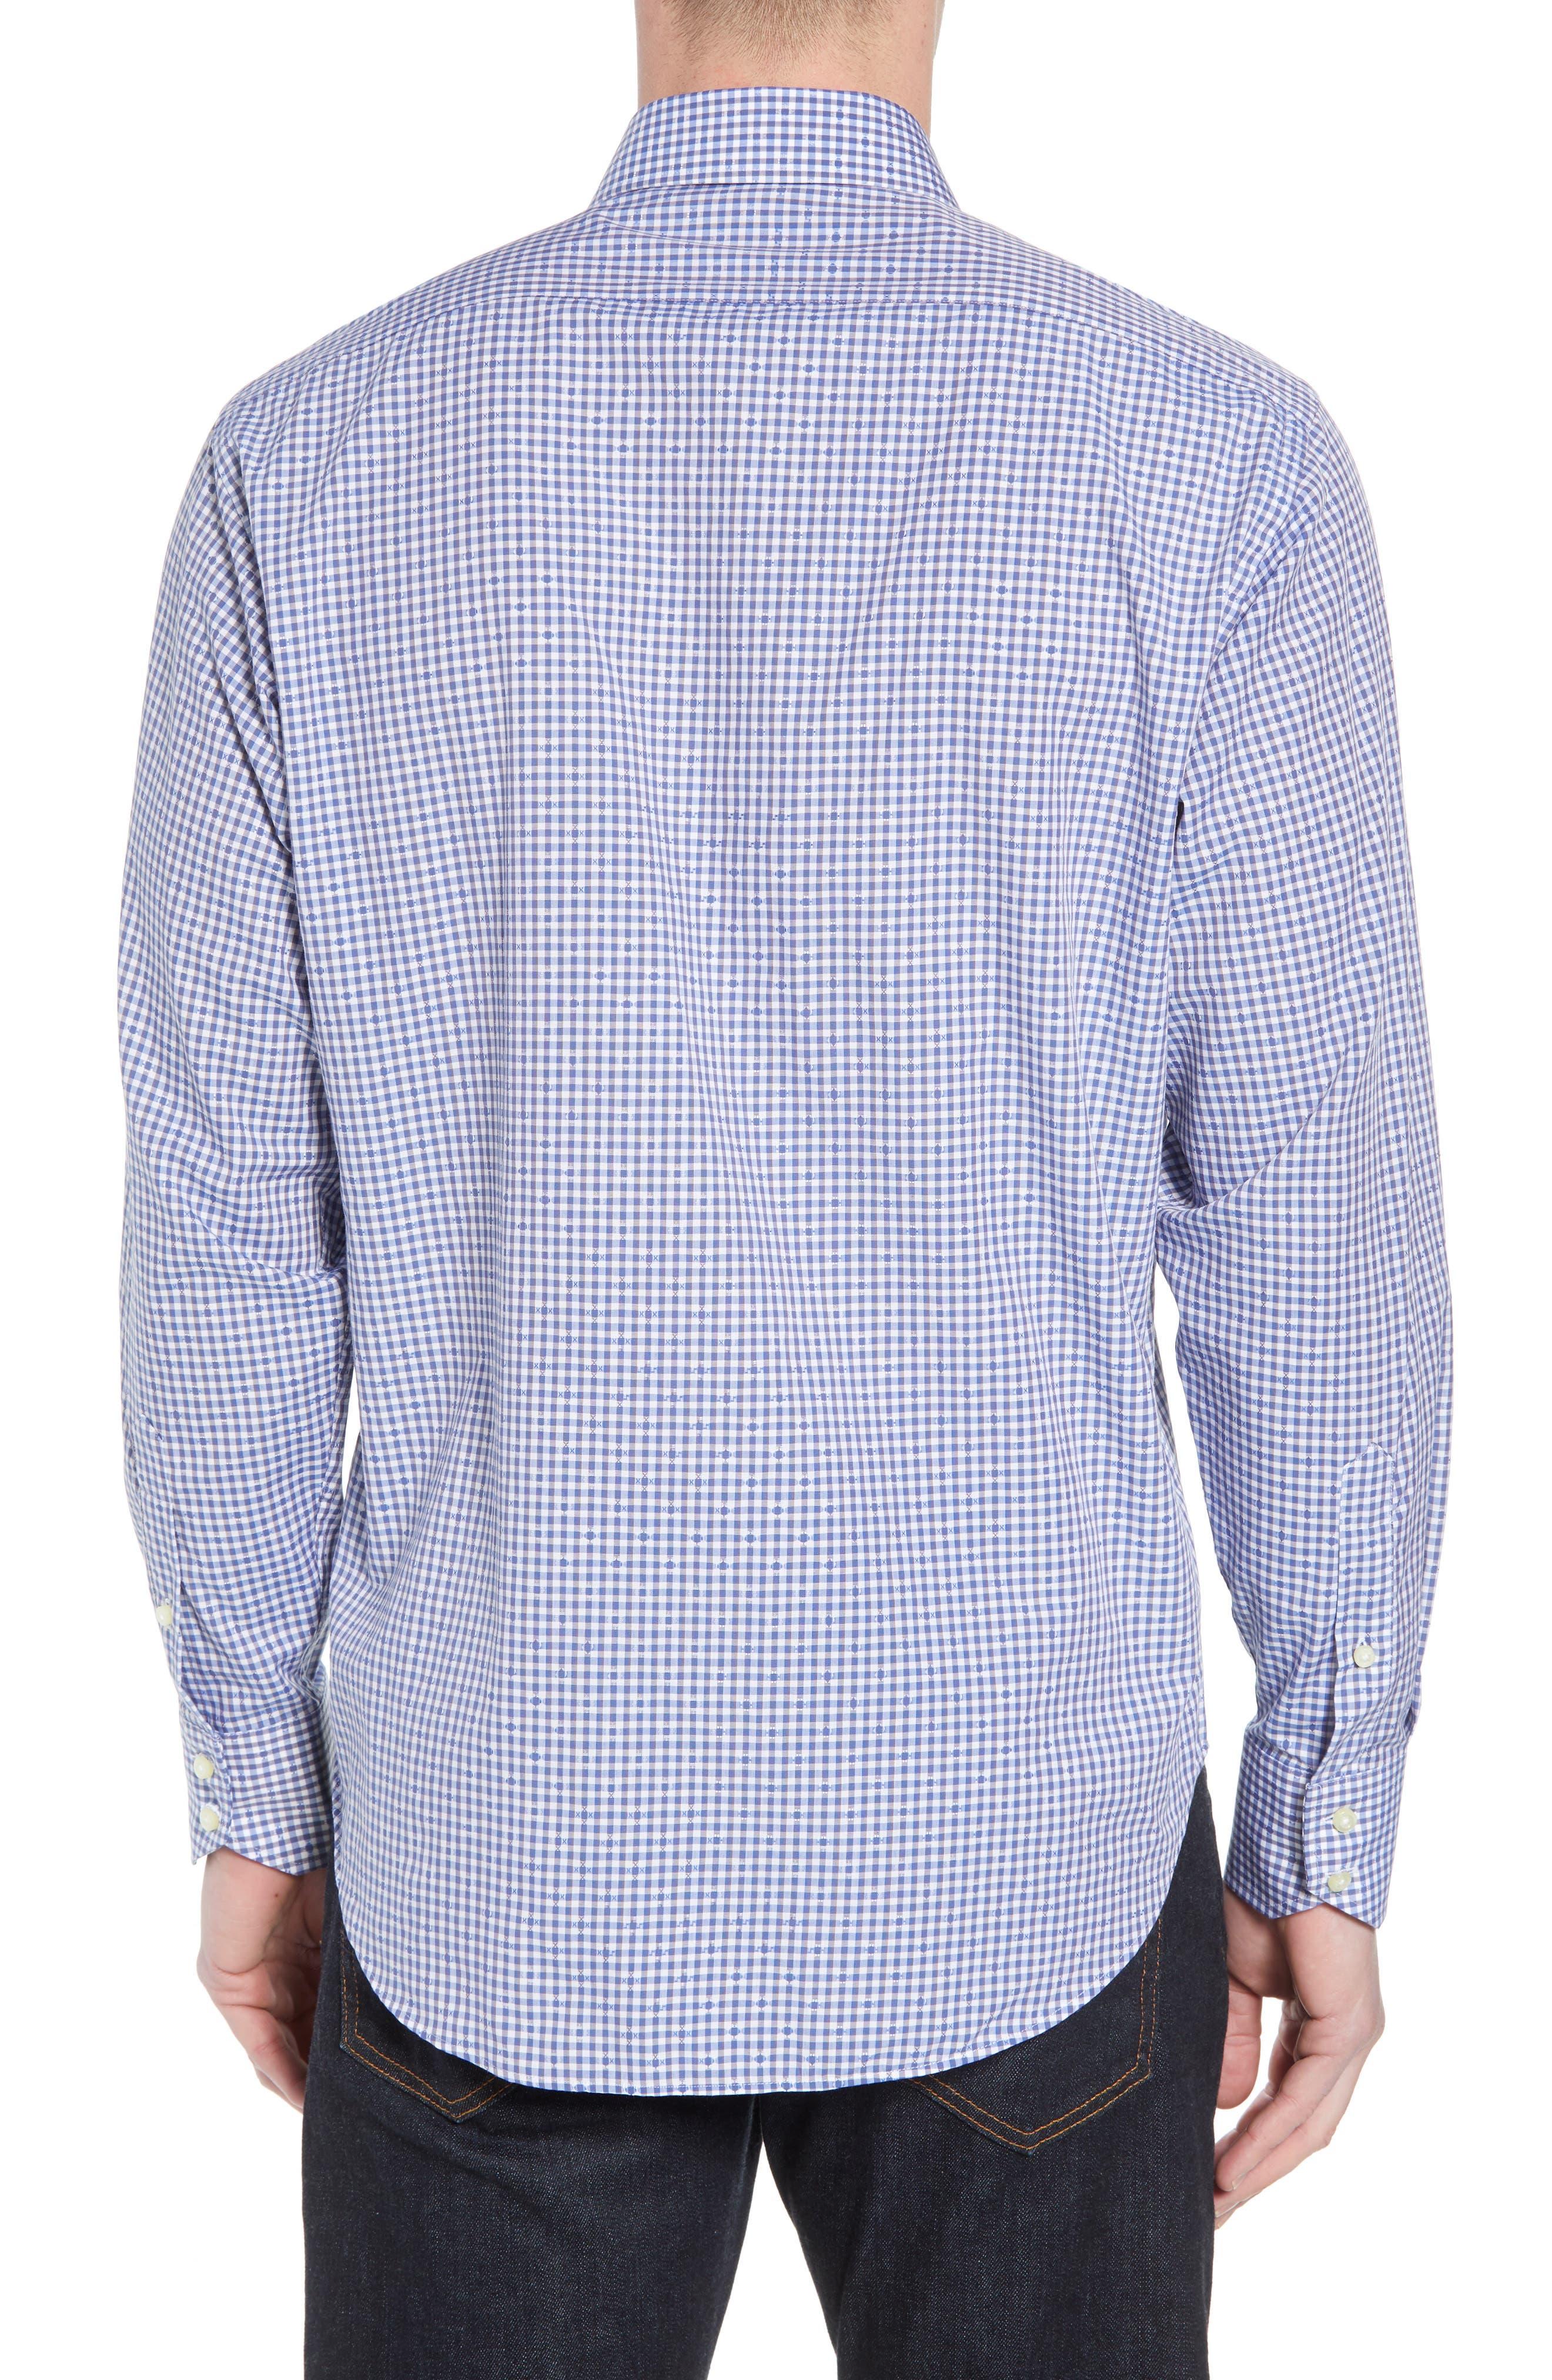 Regular Fit Check Sport Shirt,                             Alternate thumbnail 2, color,                             Blue